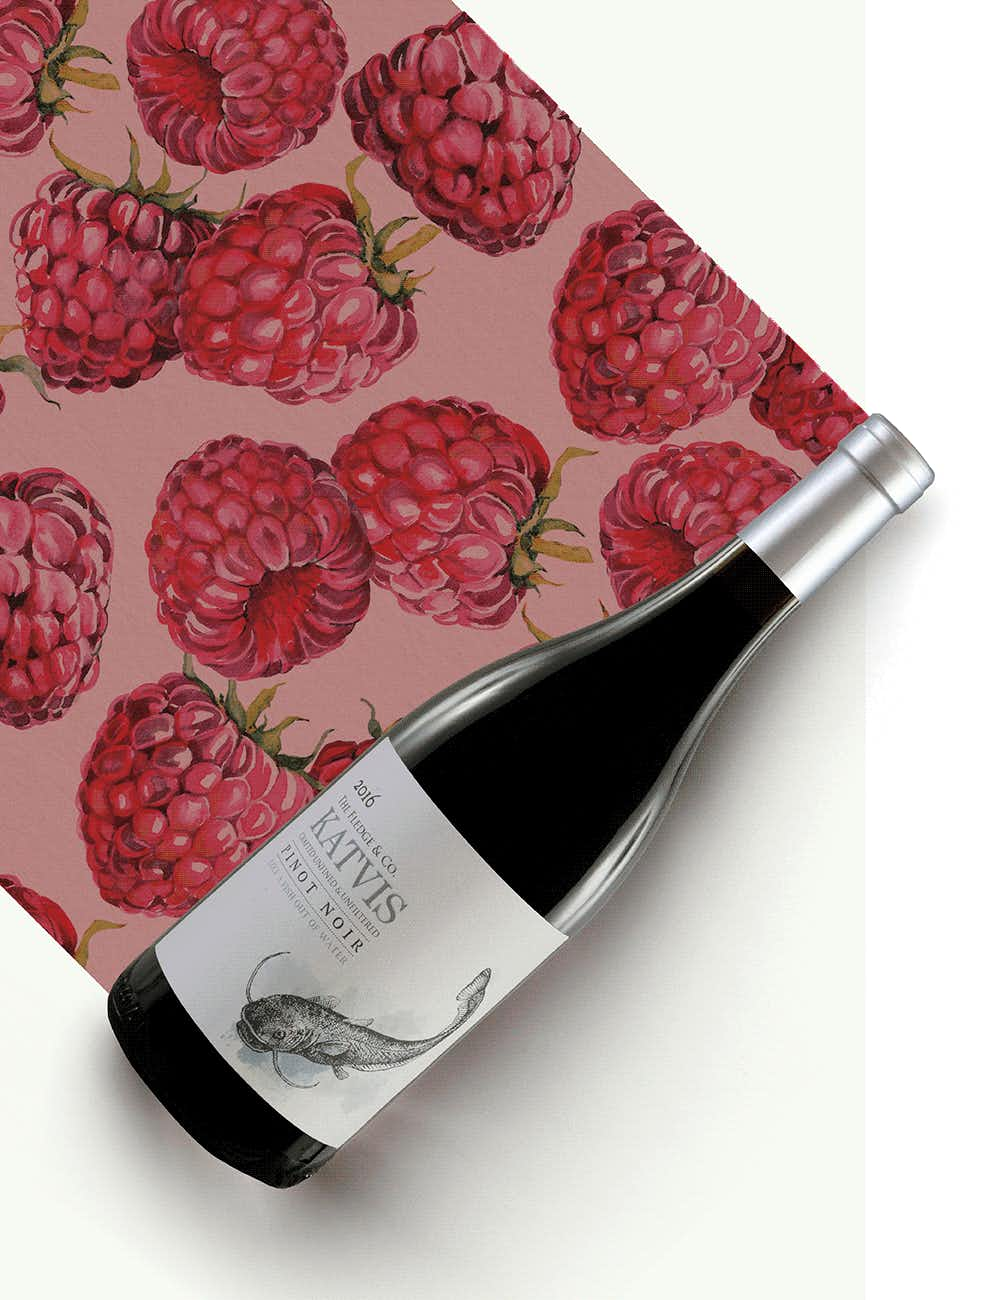 The Fledge & Company Katvis Pinot Noir 2016